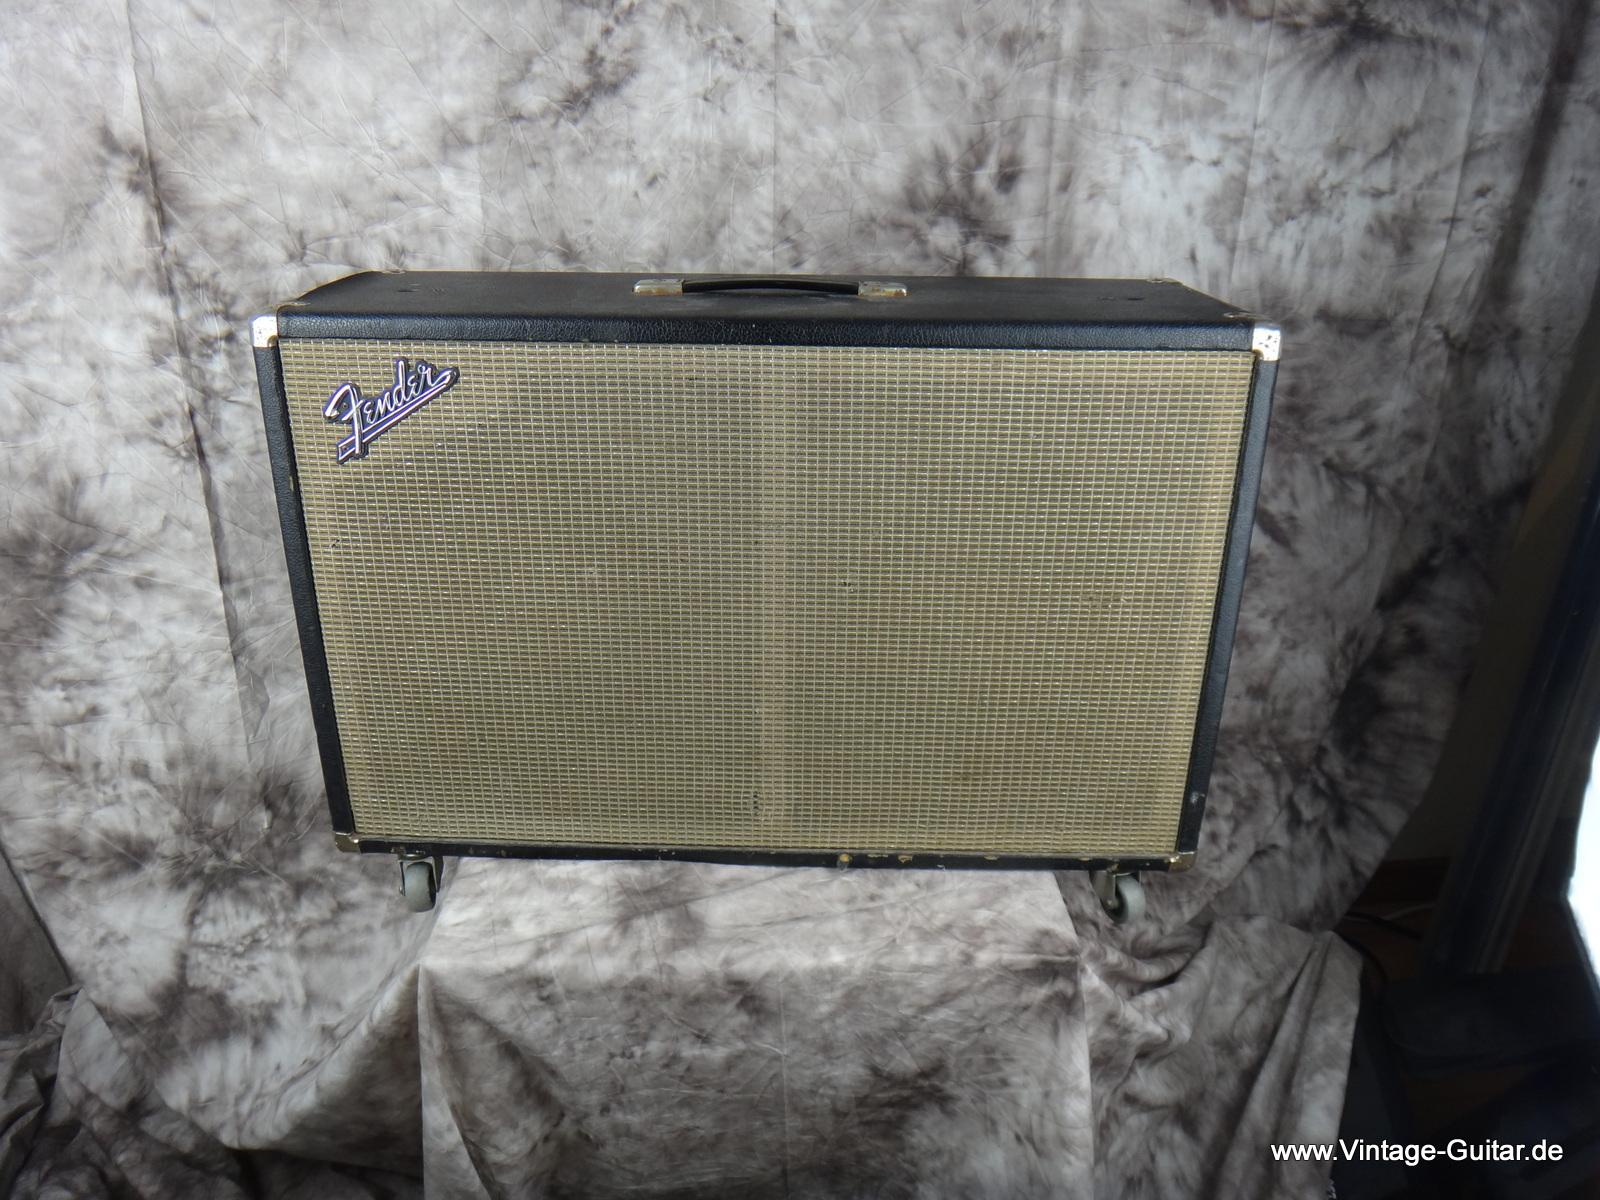 FENDER Cabinet 2x12 open back [1964] | A-1257